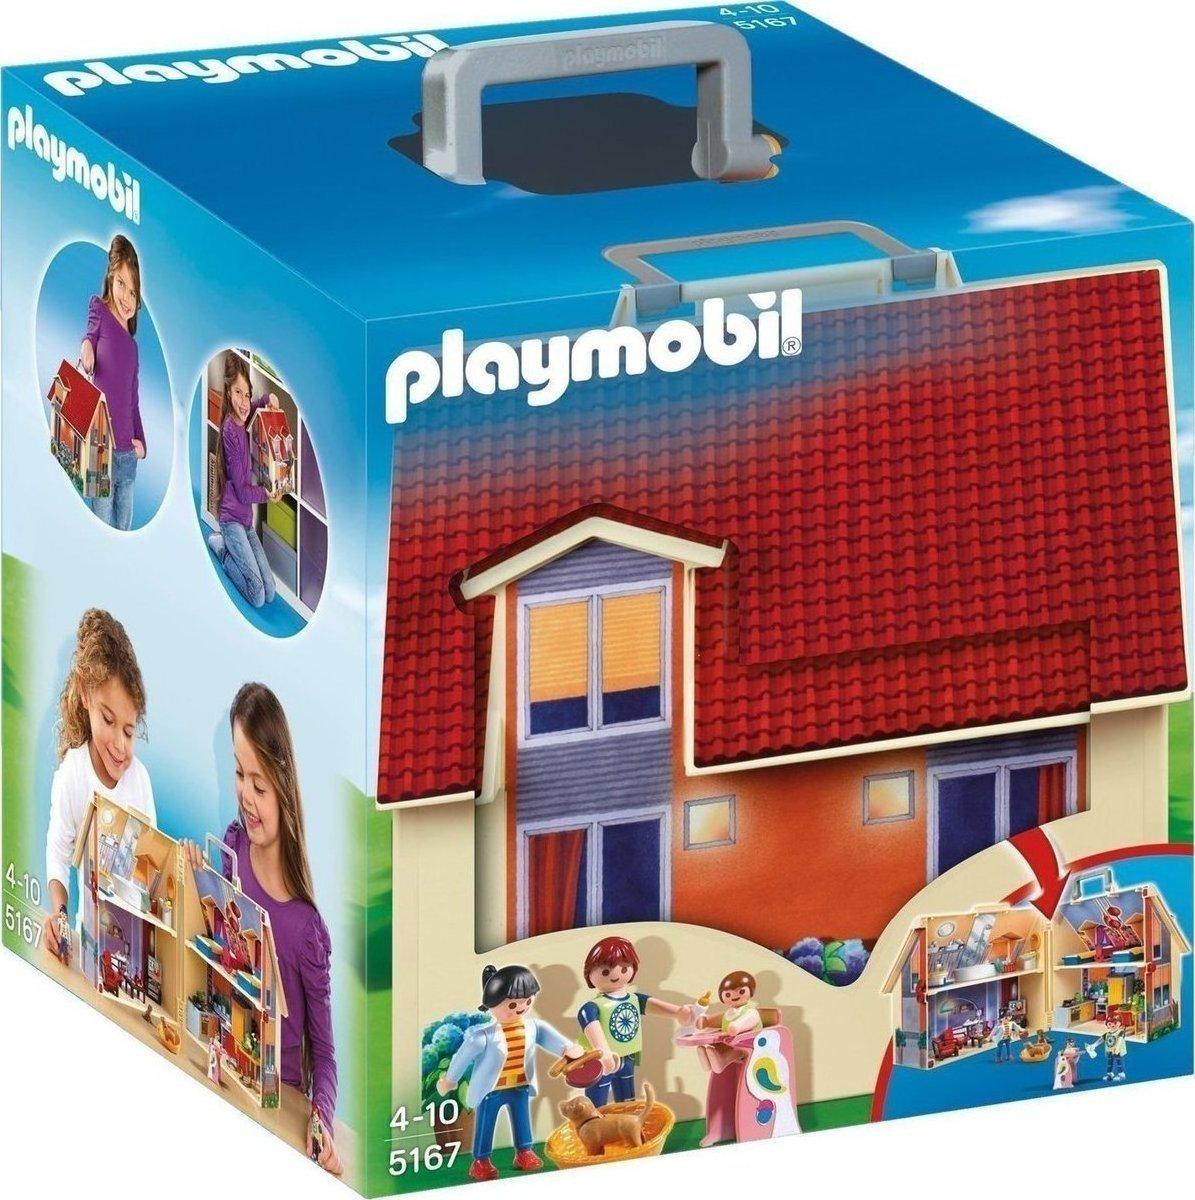 Playmobil Μοντέρνο Κουκλόσπιτο-Βαλιτσάκι